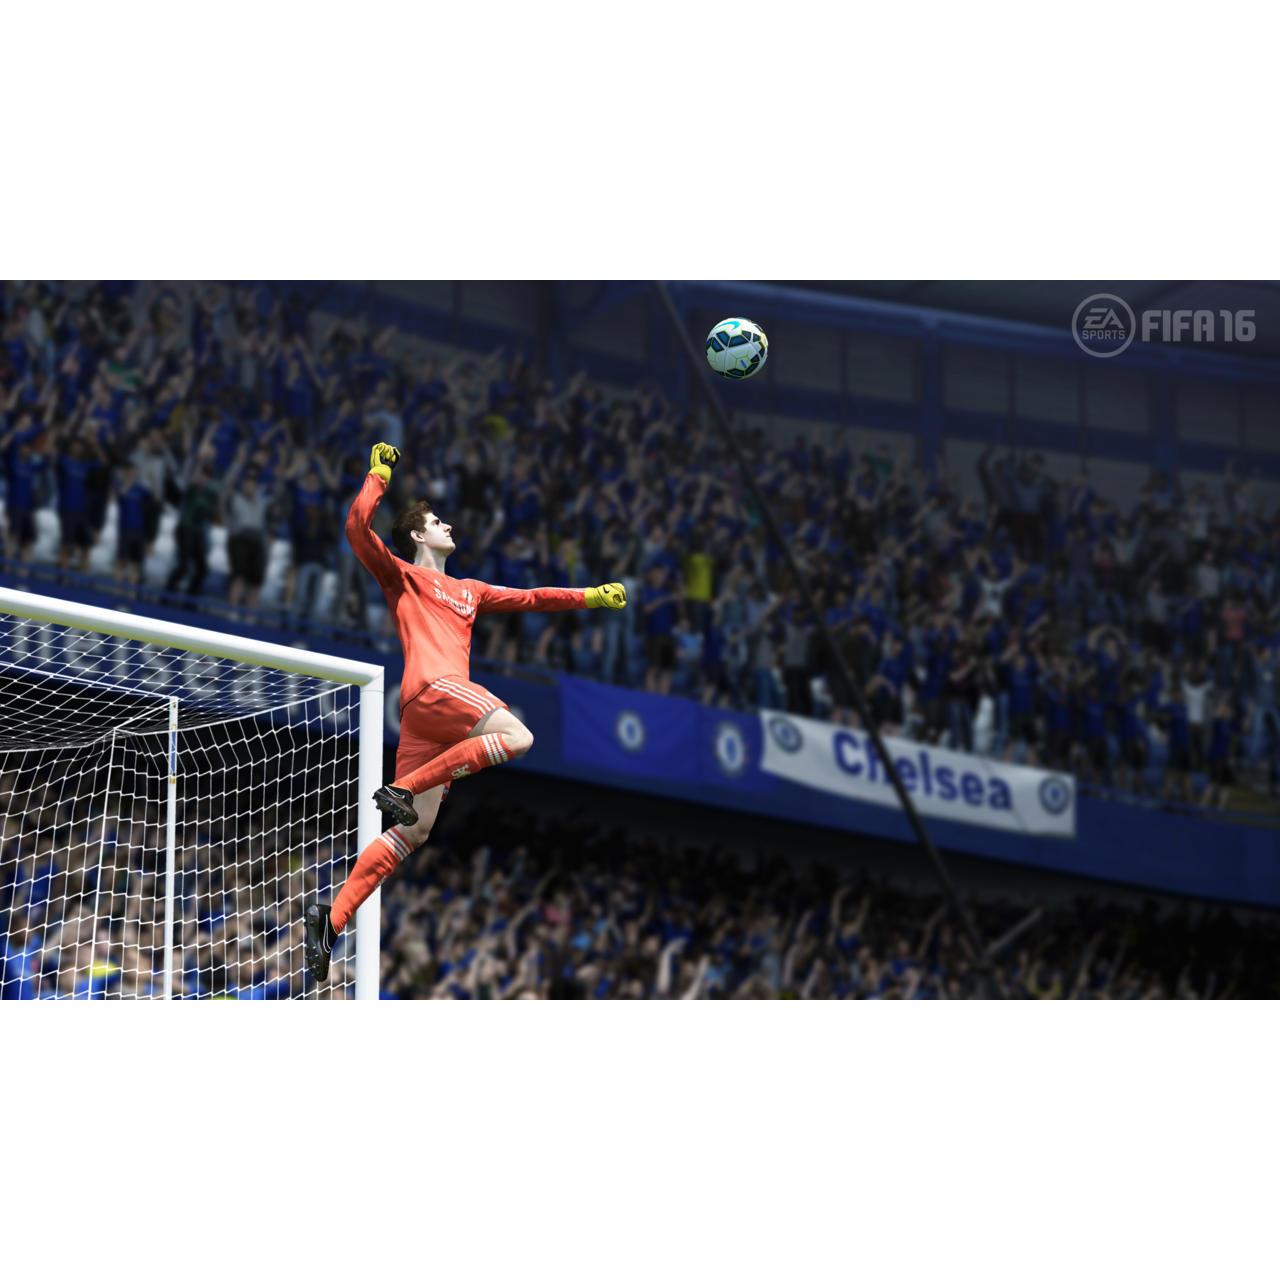 Joc FIFA 16 pentru PlayStation 4 7